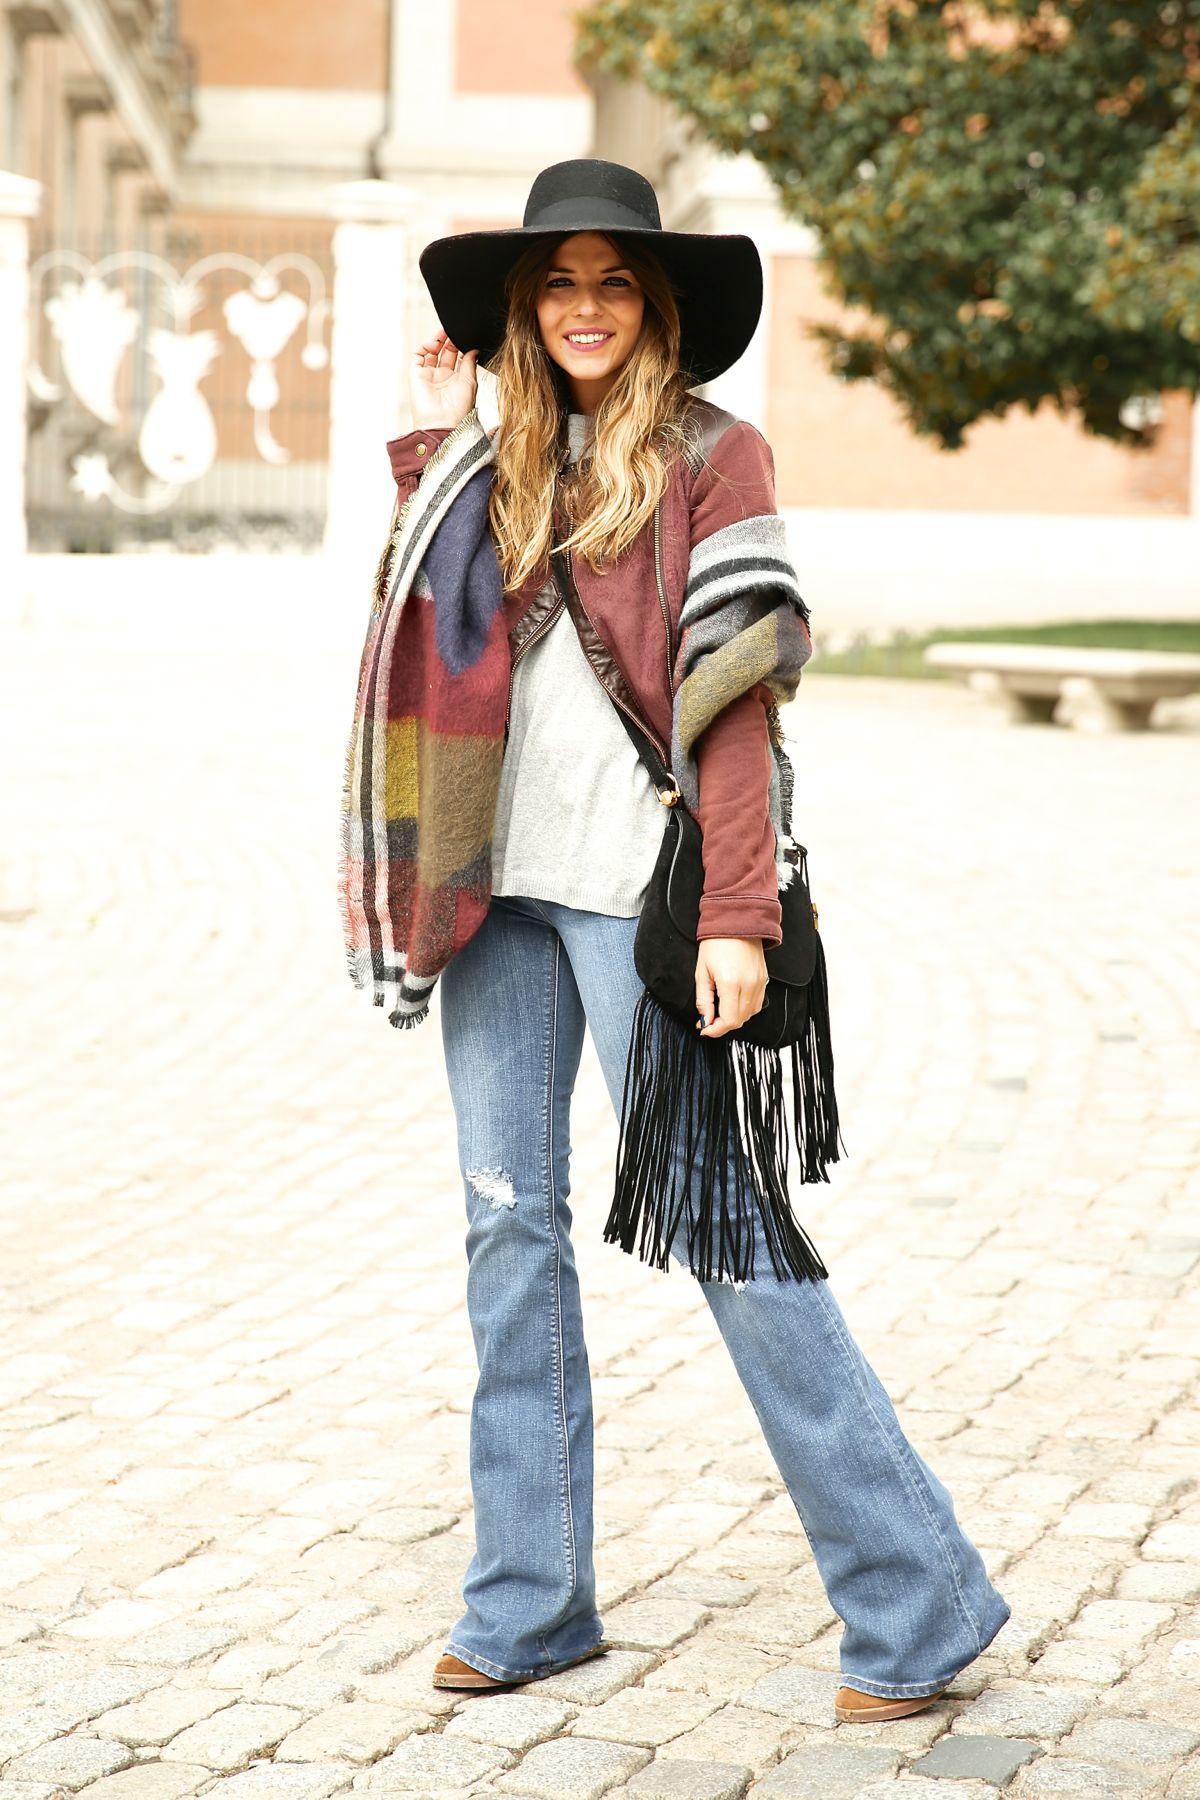 trendy_taste-look-outfit-street_style-ootd-blog-blogger-fashion_spain-moda_españa-AD-adolfo_dominguez-amaia_salamanca-boho-hippie-sombrero-hat-biker-flecos-fringes-11